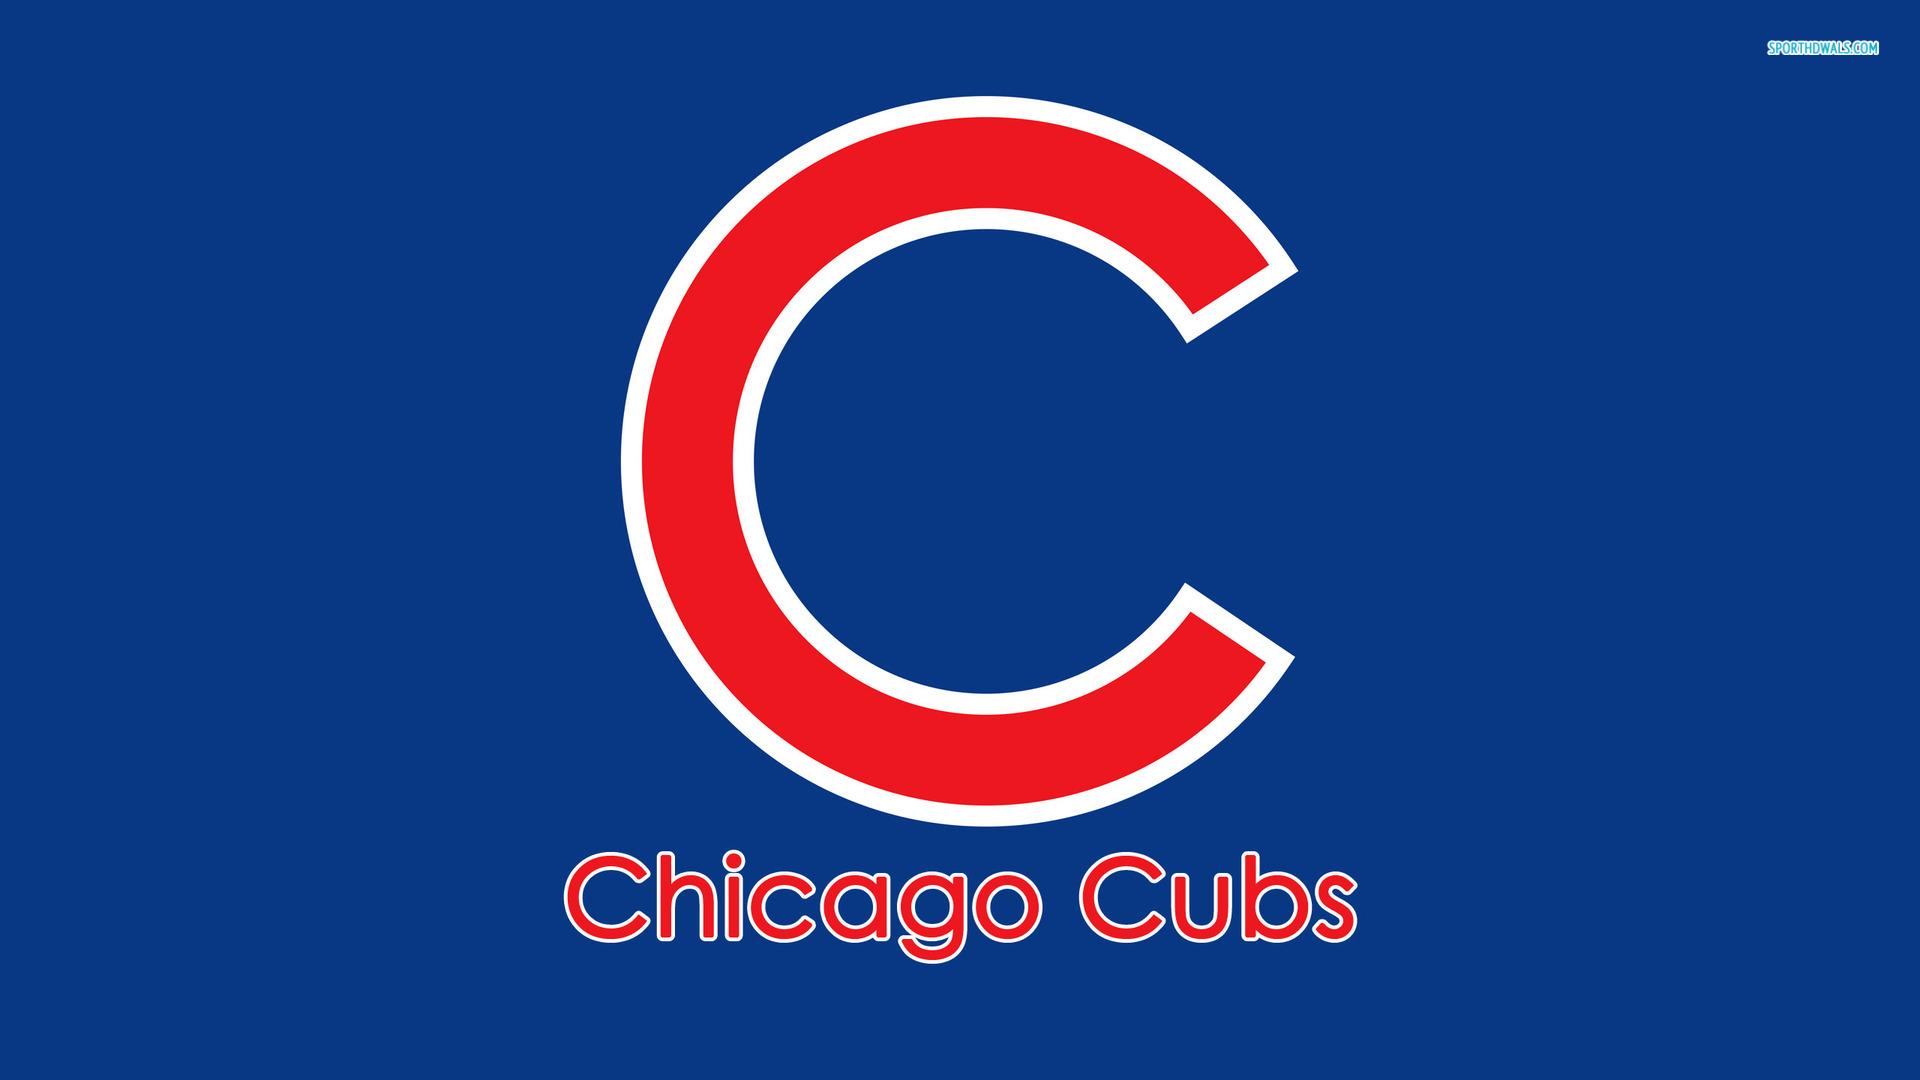 Chicago Cubs wallpaper Chicago Cubs wallpapers 1920x1080